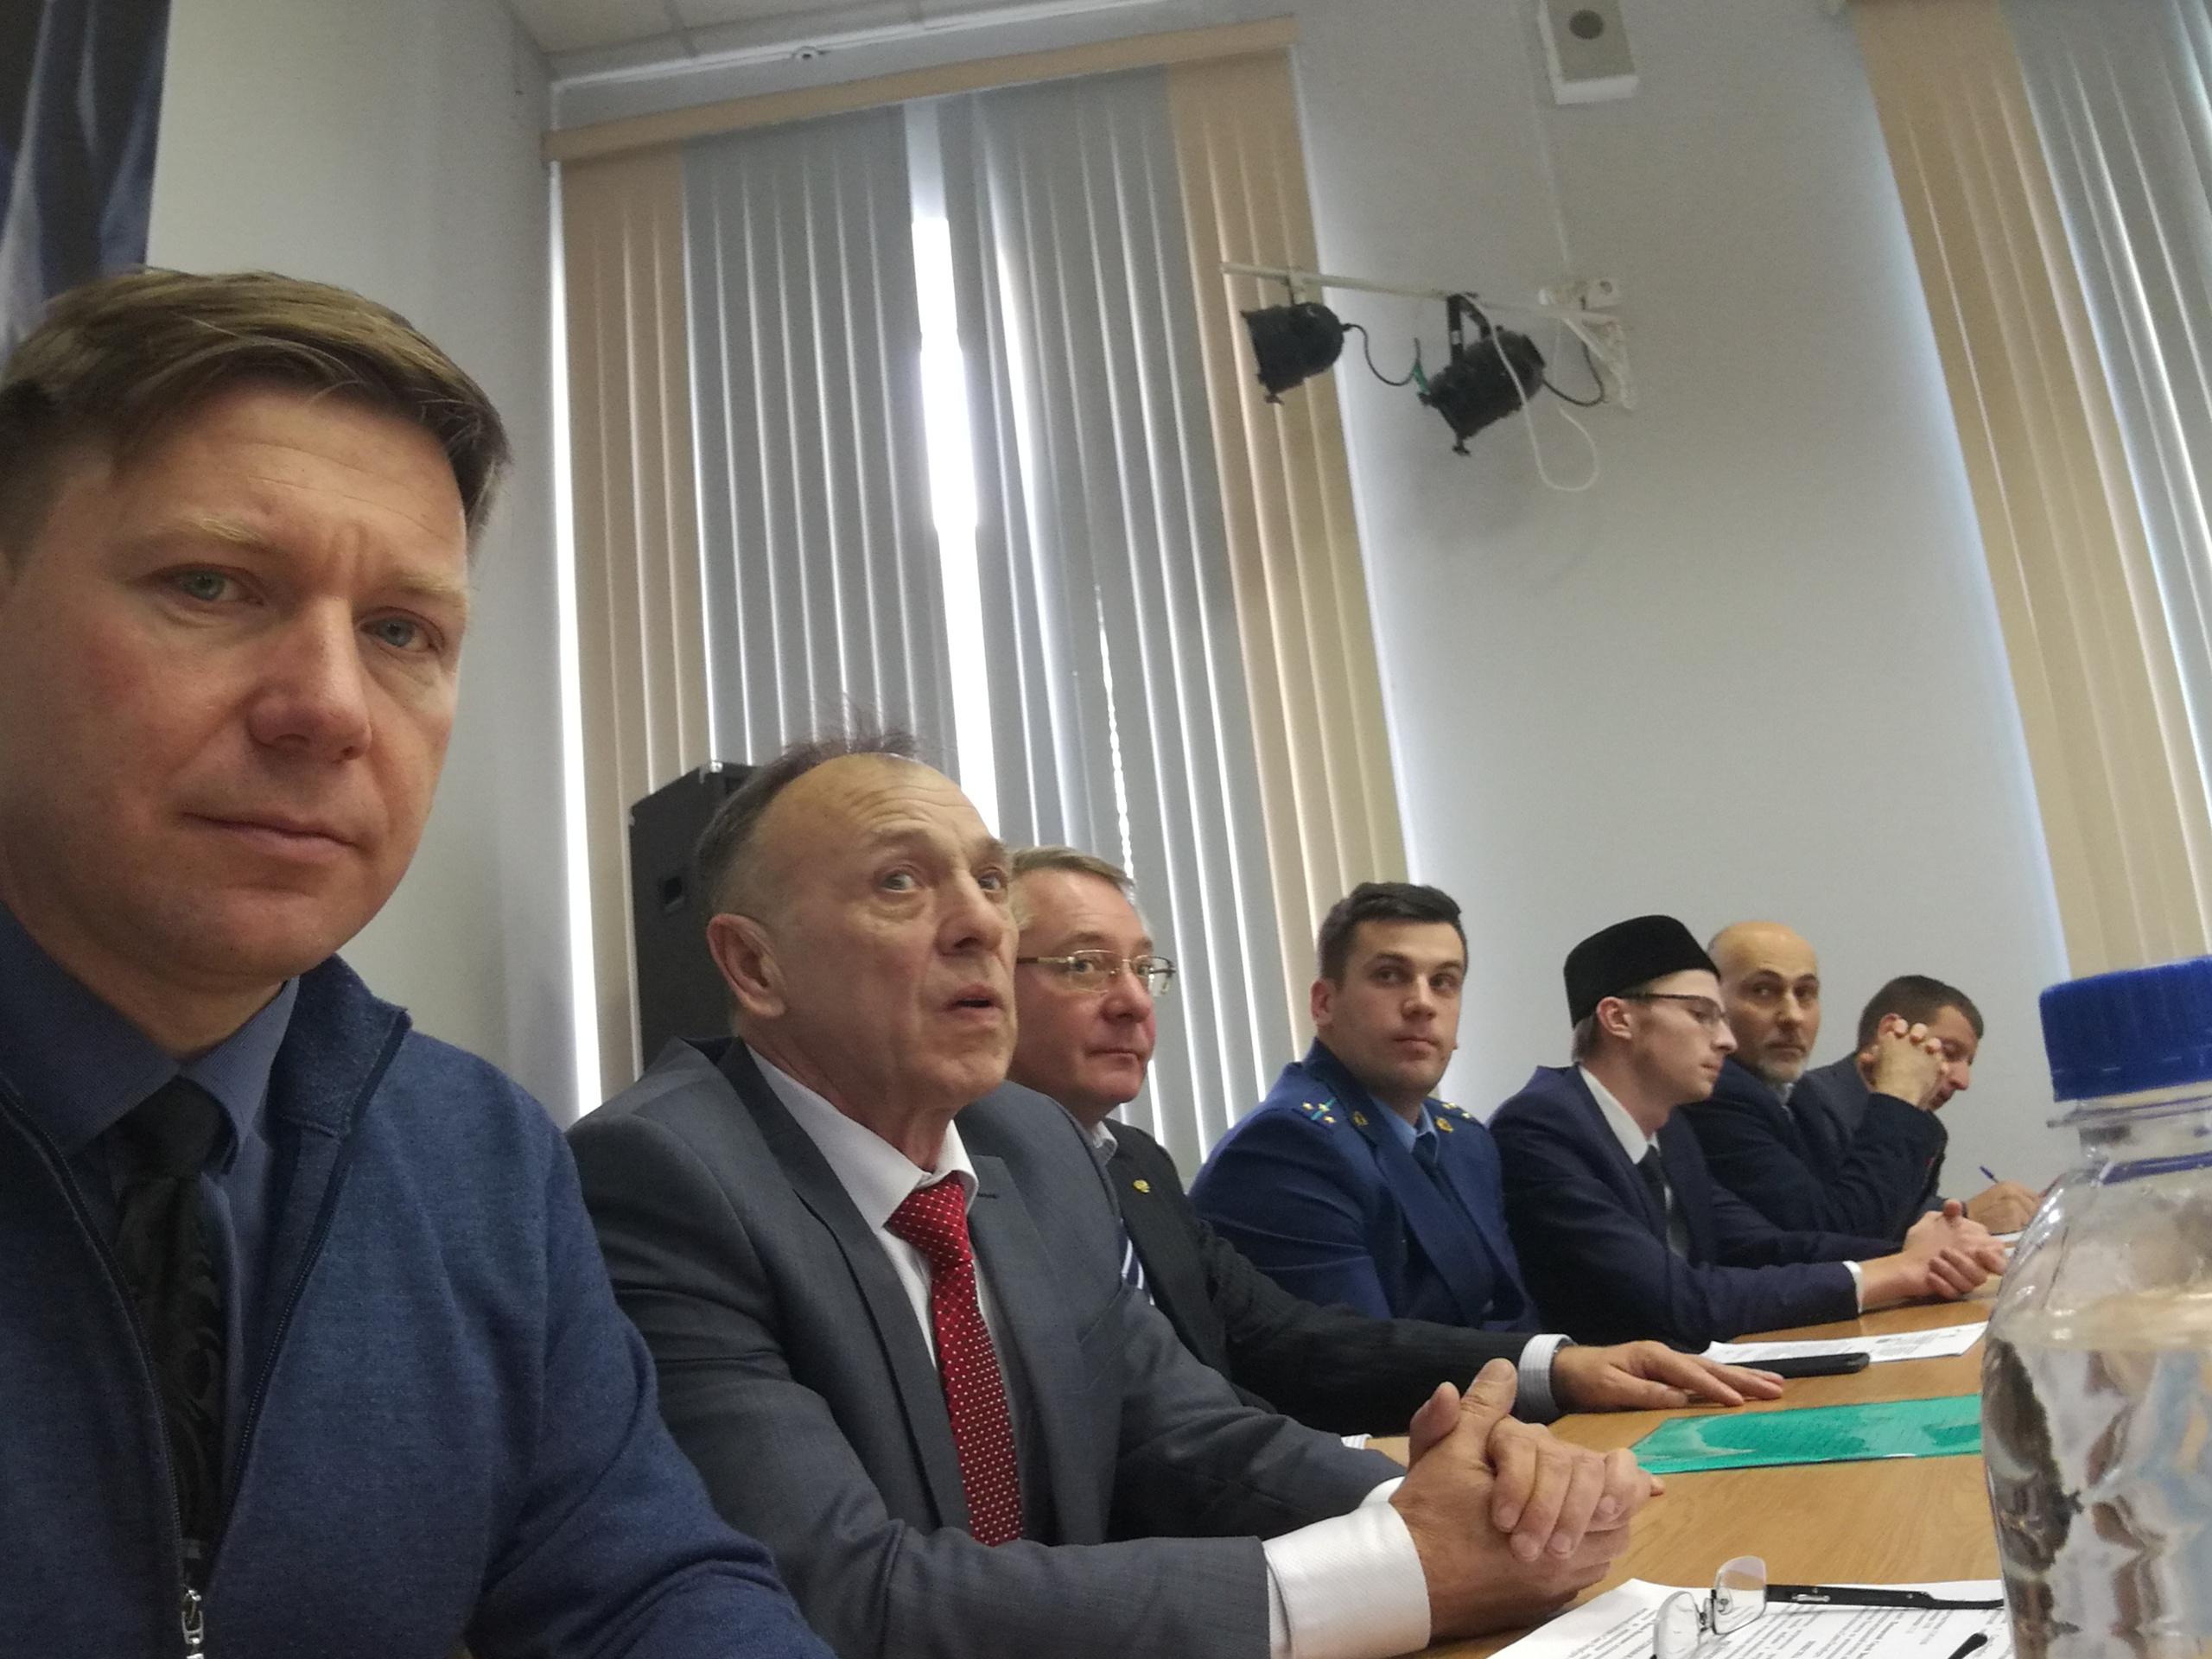 Докладчики. Семинар «Терроризм-угроза обществу», СПбГМУ, 30.10.2019